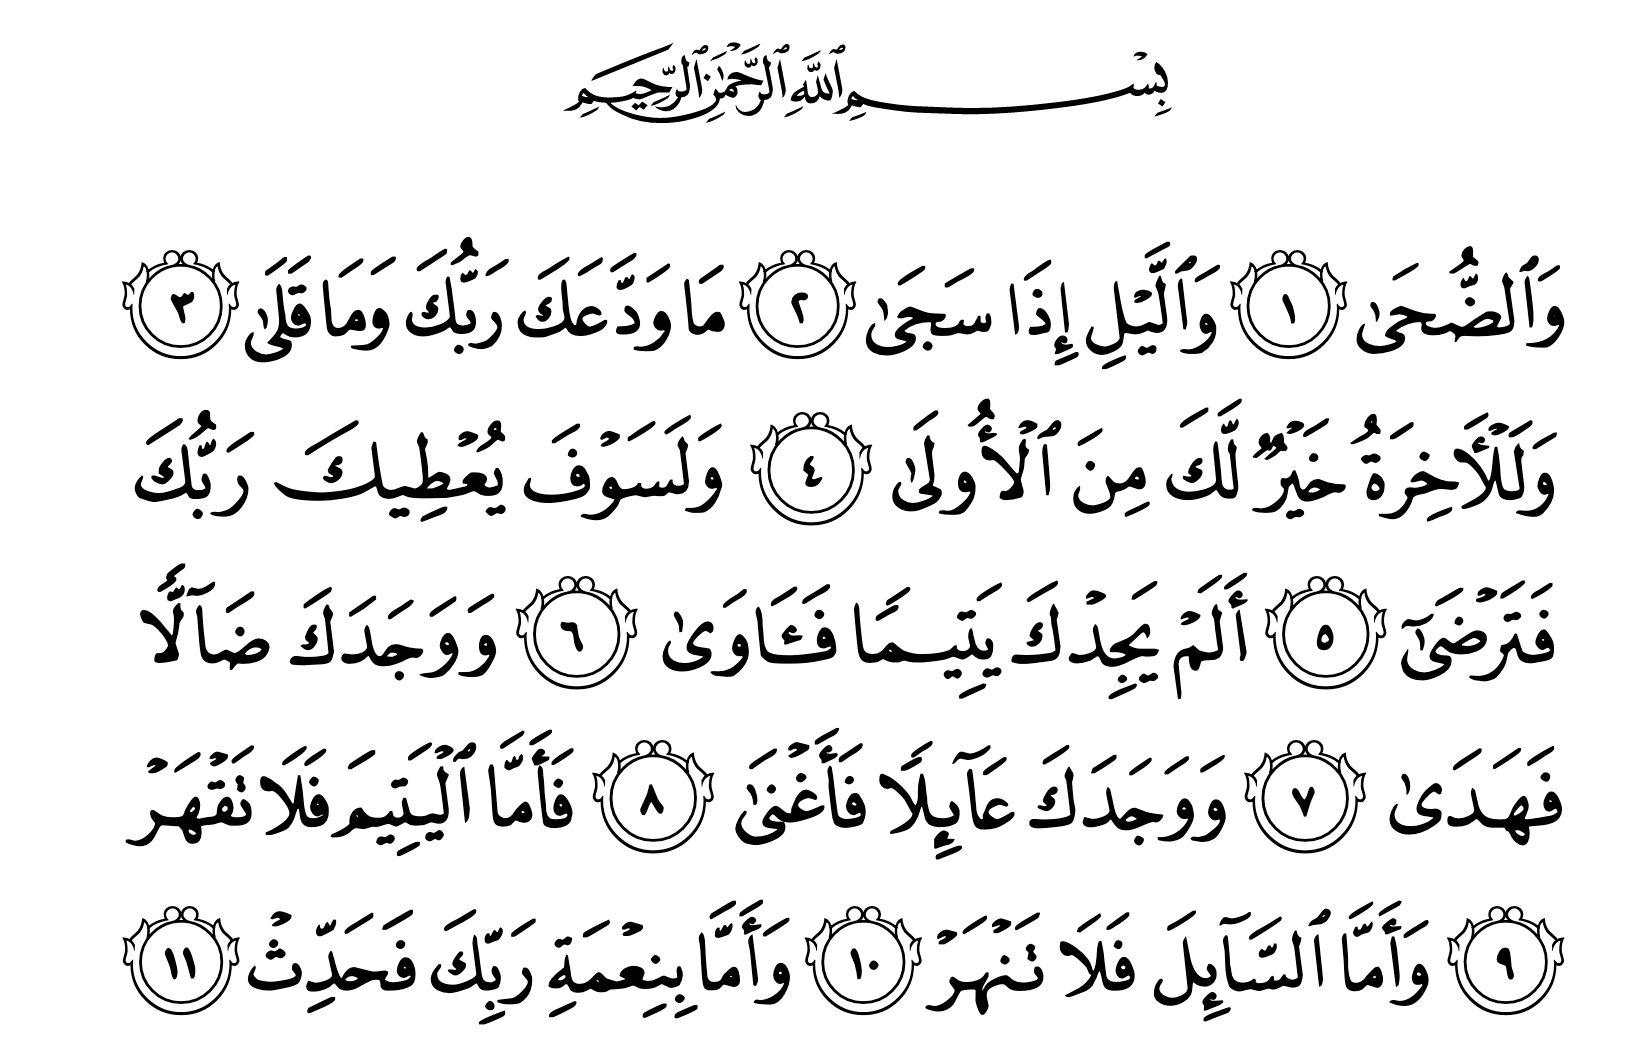 8 Surat Pendek dan Sederhana untuk Dihapal Selama Bulan Ramadhan